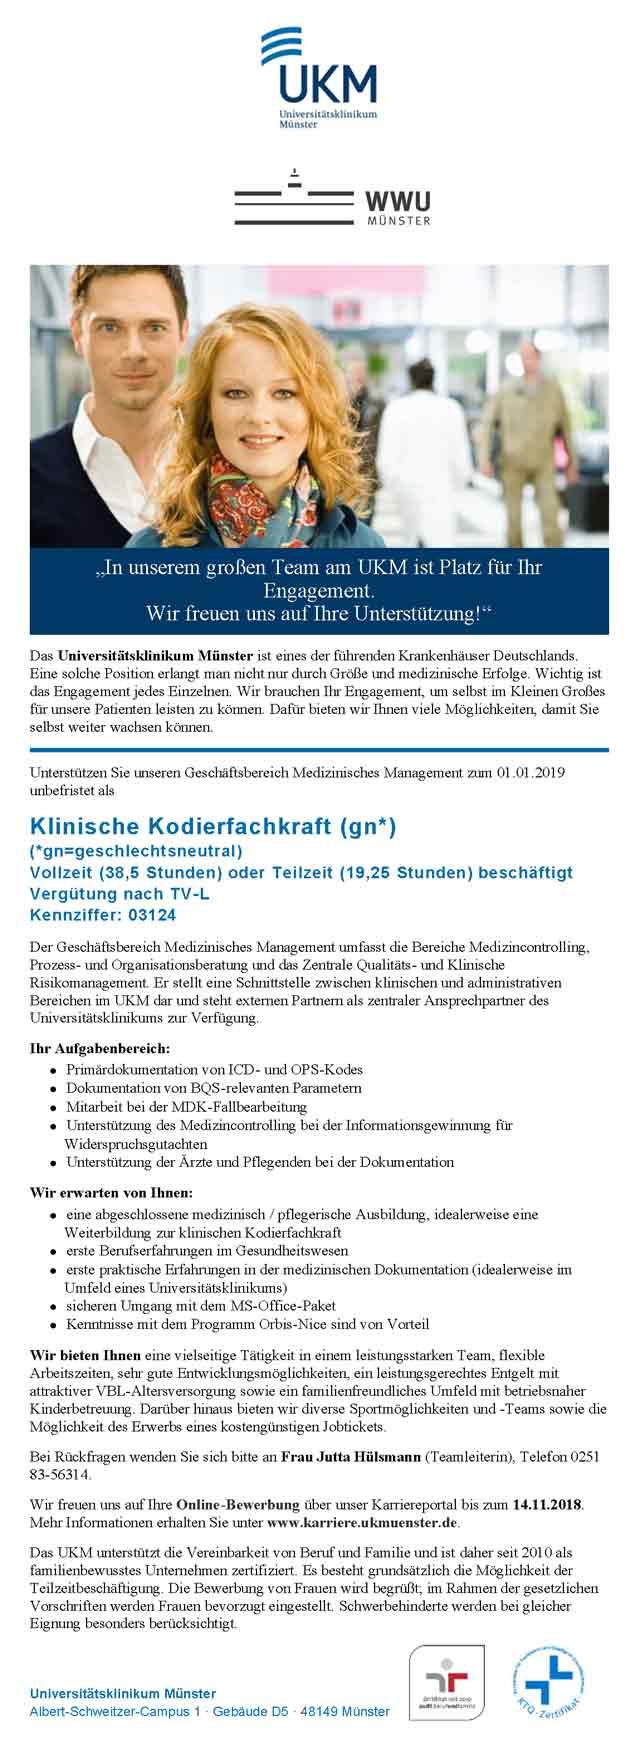 Universitätsklinikum Münster: Klinische Kodierfachkraft (geschlechtsneutral)